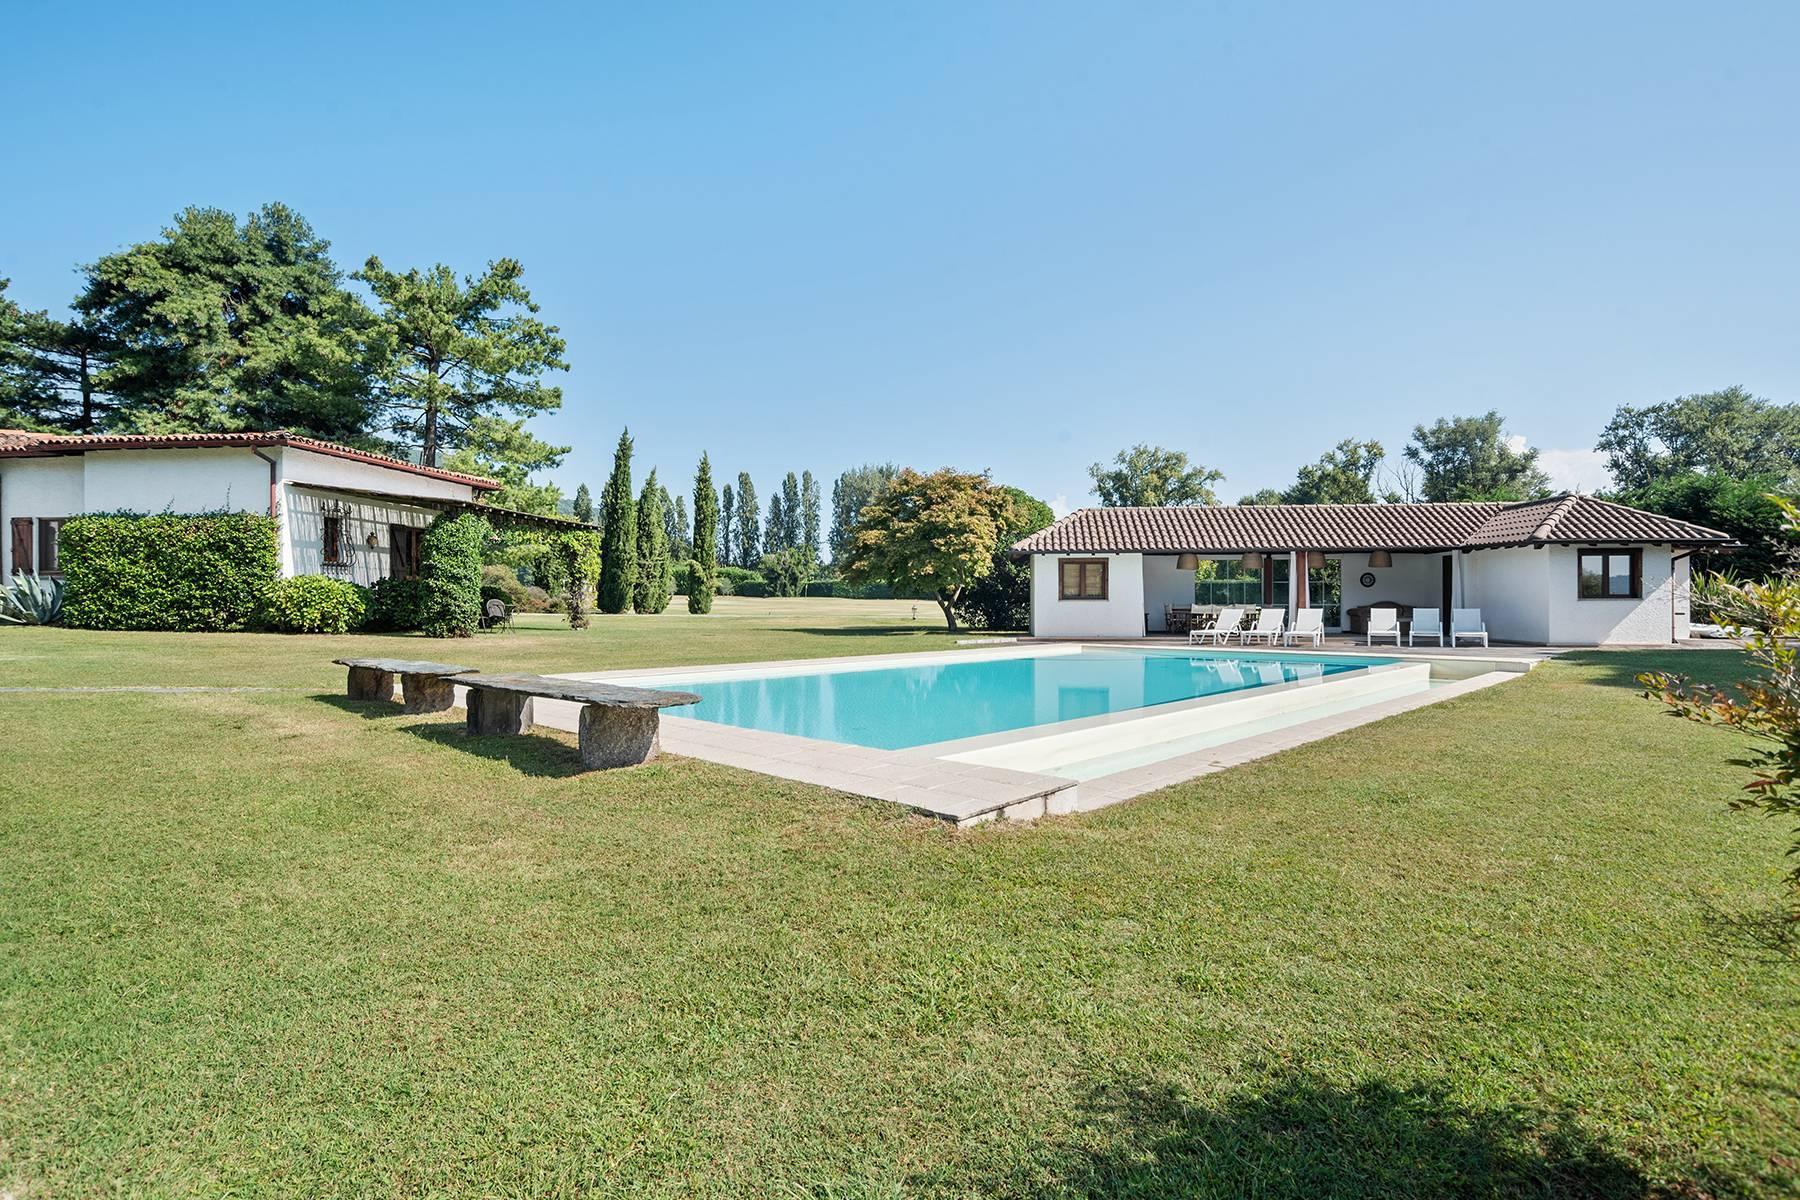 Charmante Villa in Lesa, mitten in der Natur - 45